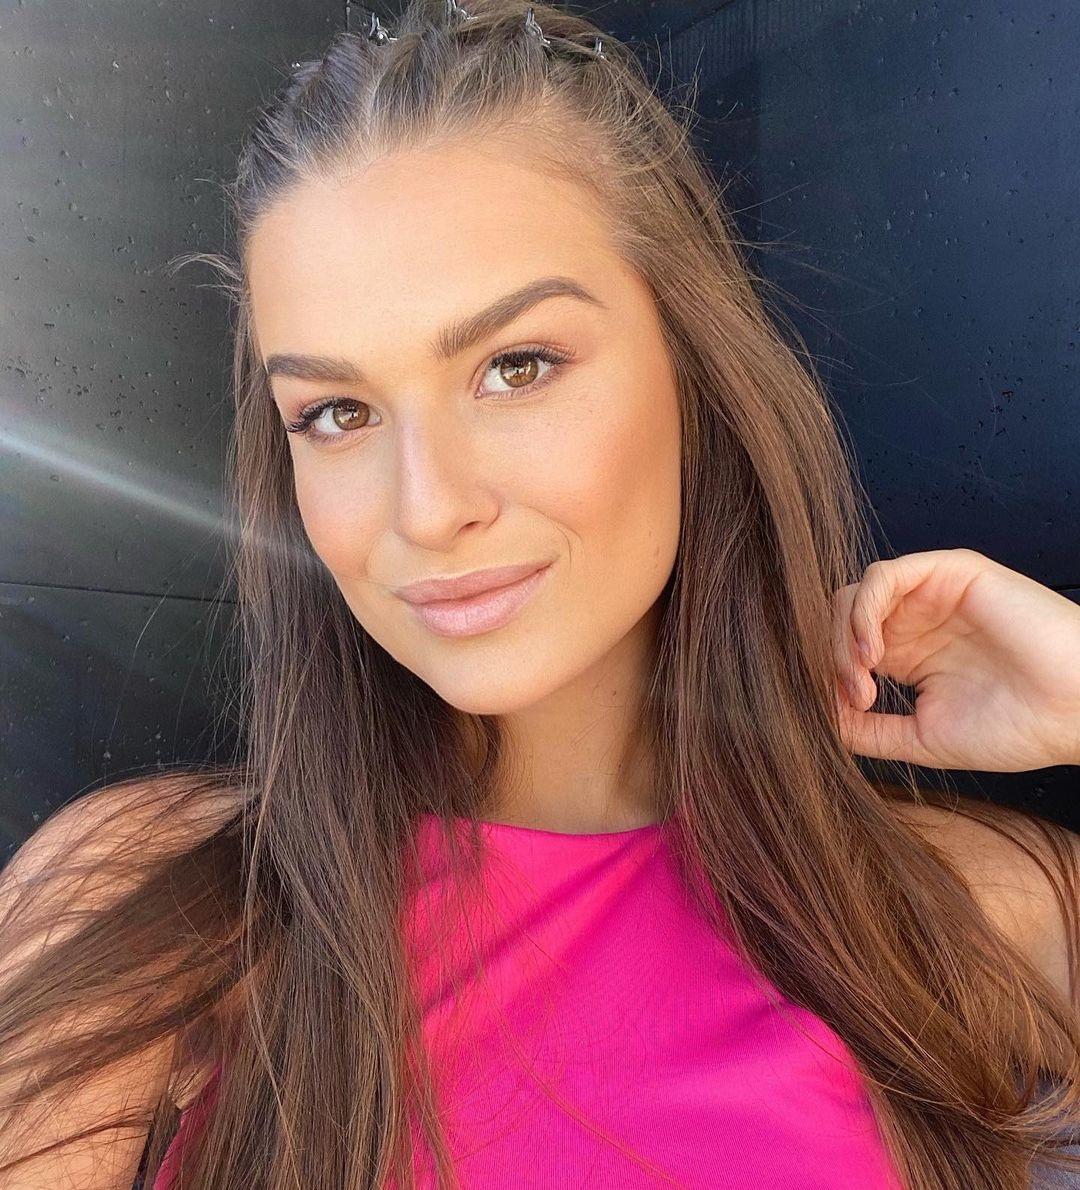 Dominika-Vinsova-Wallpapers-Insta-Fit-Bio-6